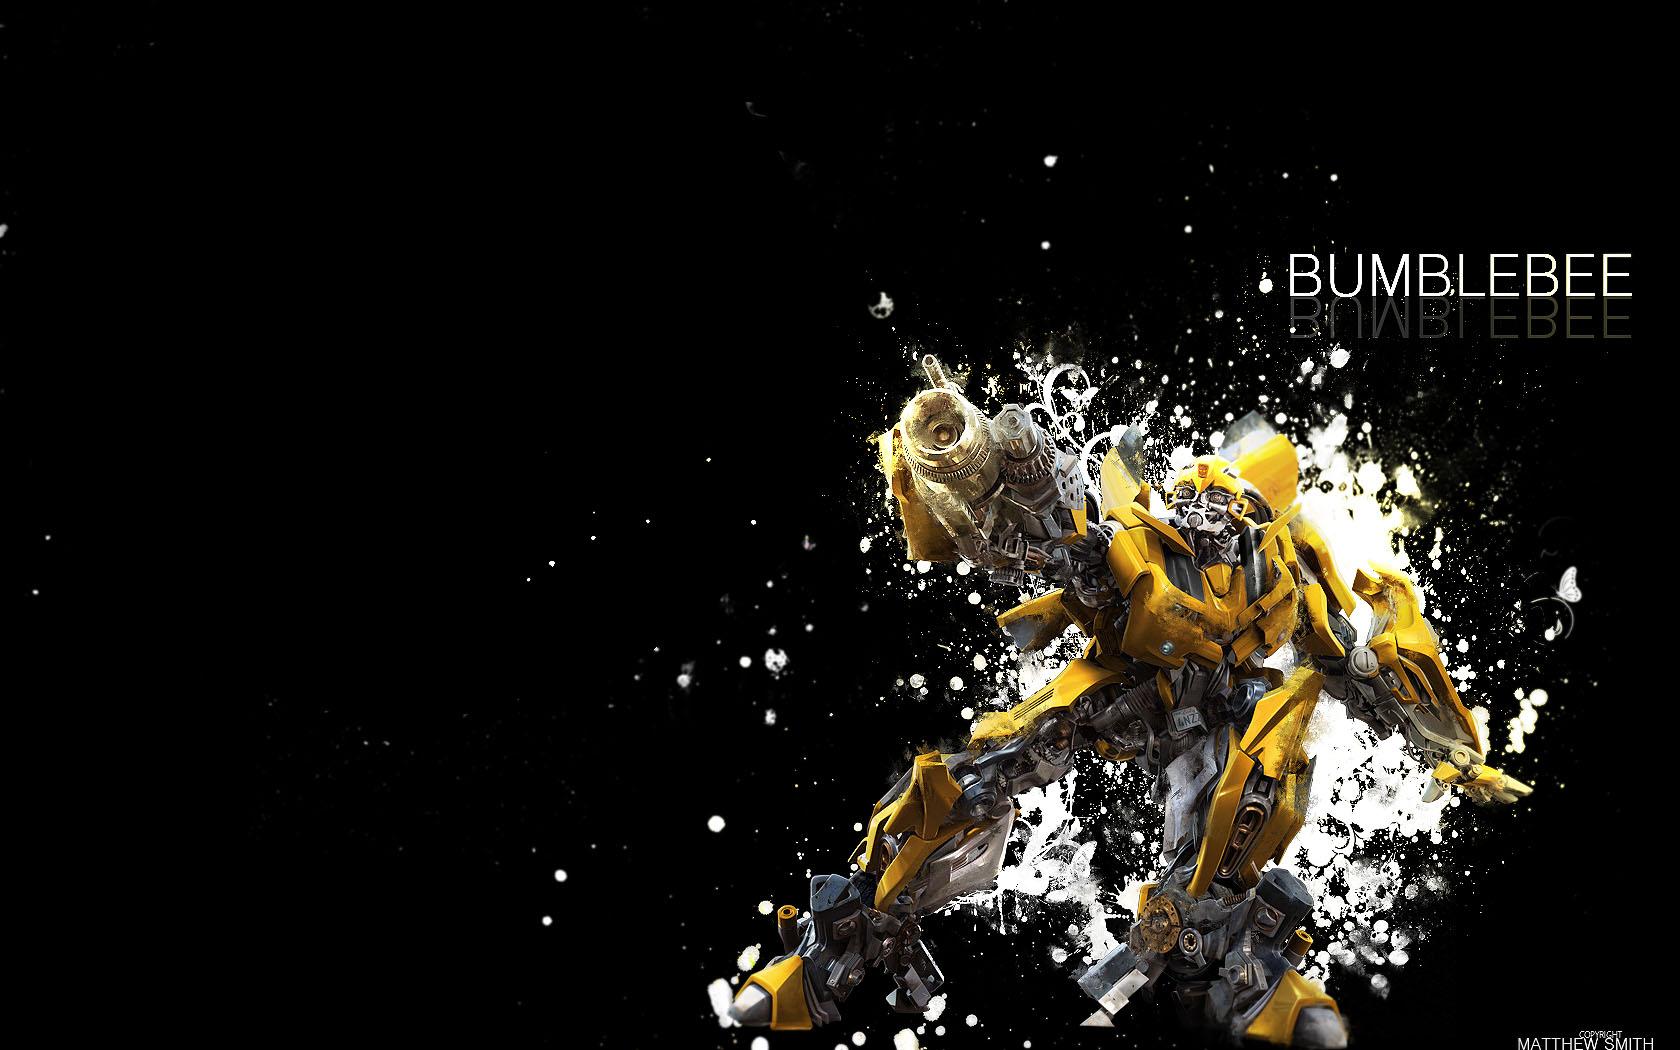 Bumblebee Wallpaper 2 1680x050 By Unique2892 On Deviantart